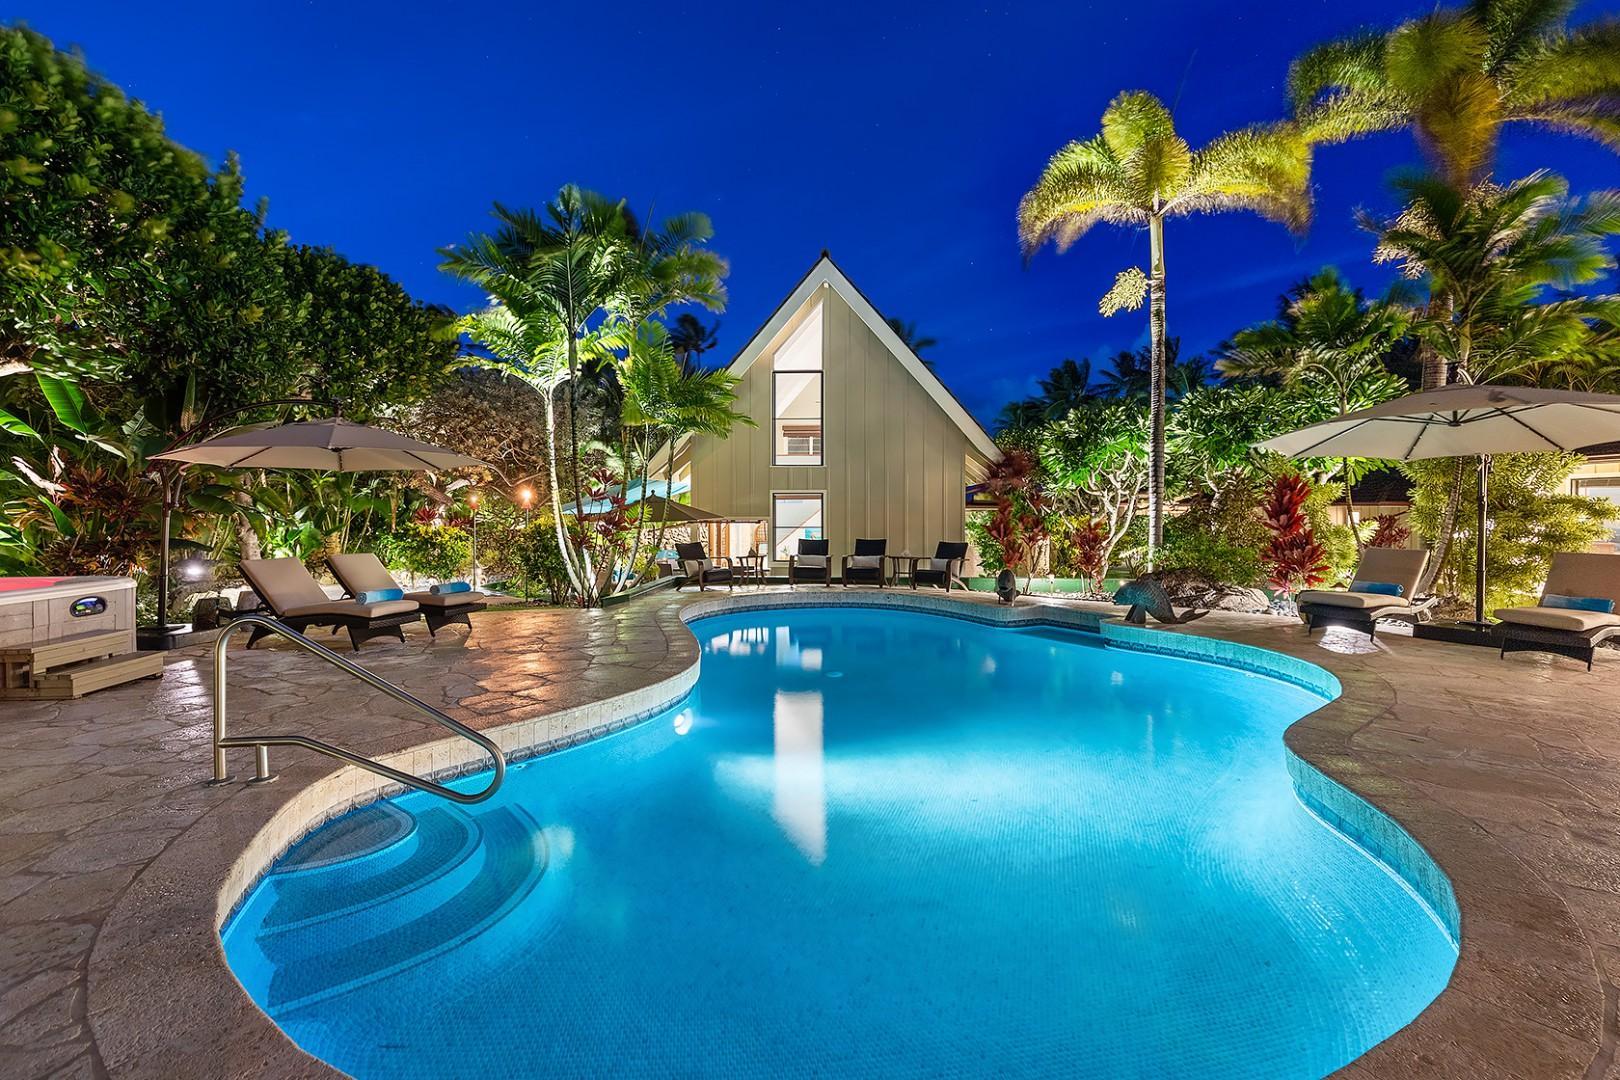 Pool - Pool House